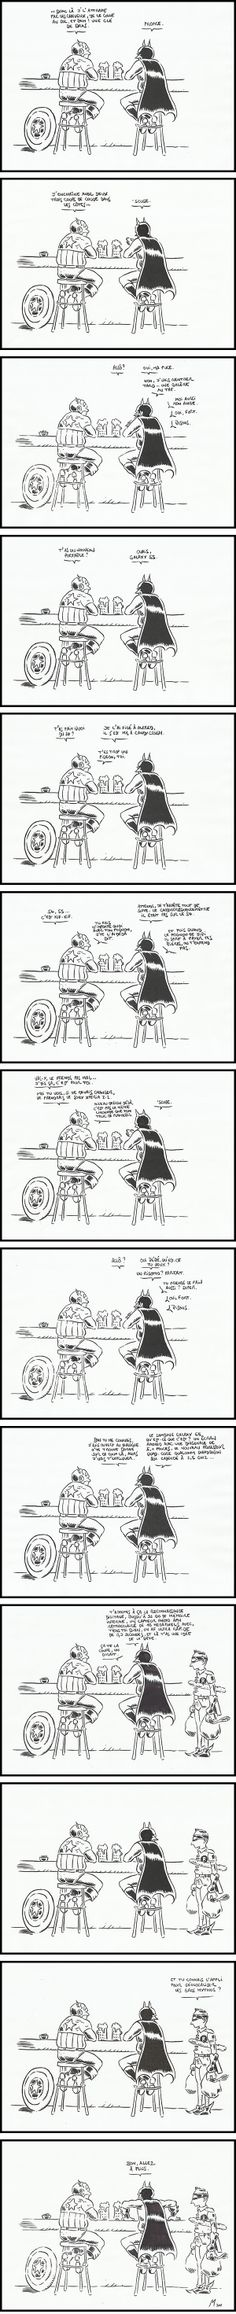 [BD Geek] Super-héros mais aussi fanboys…